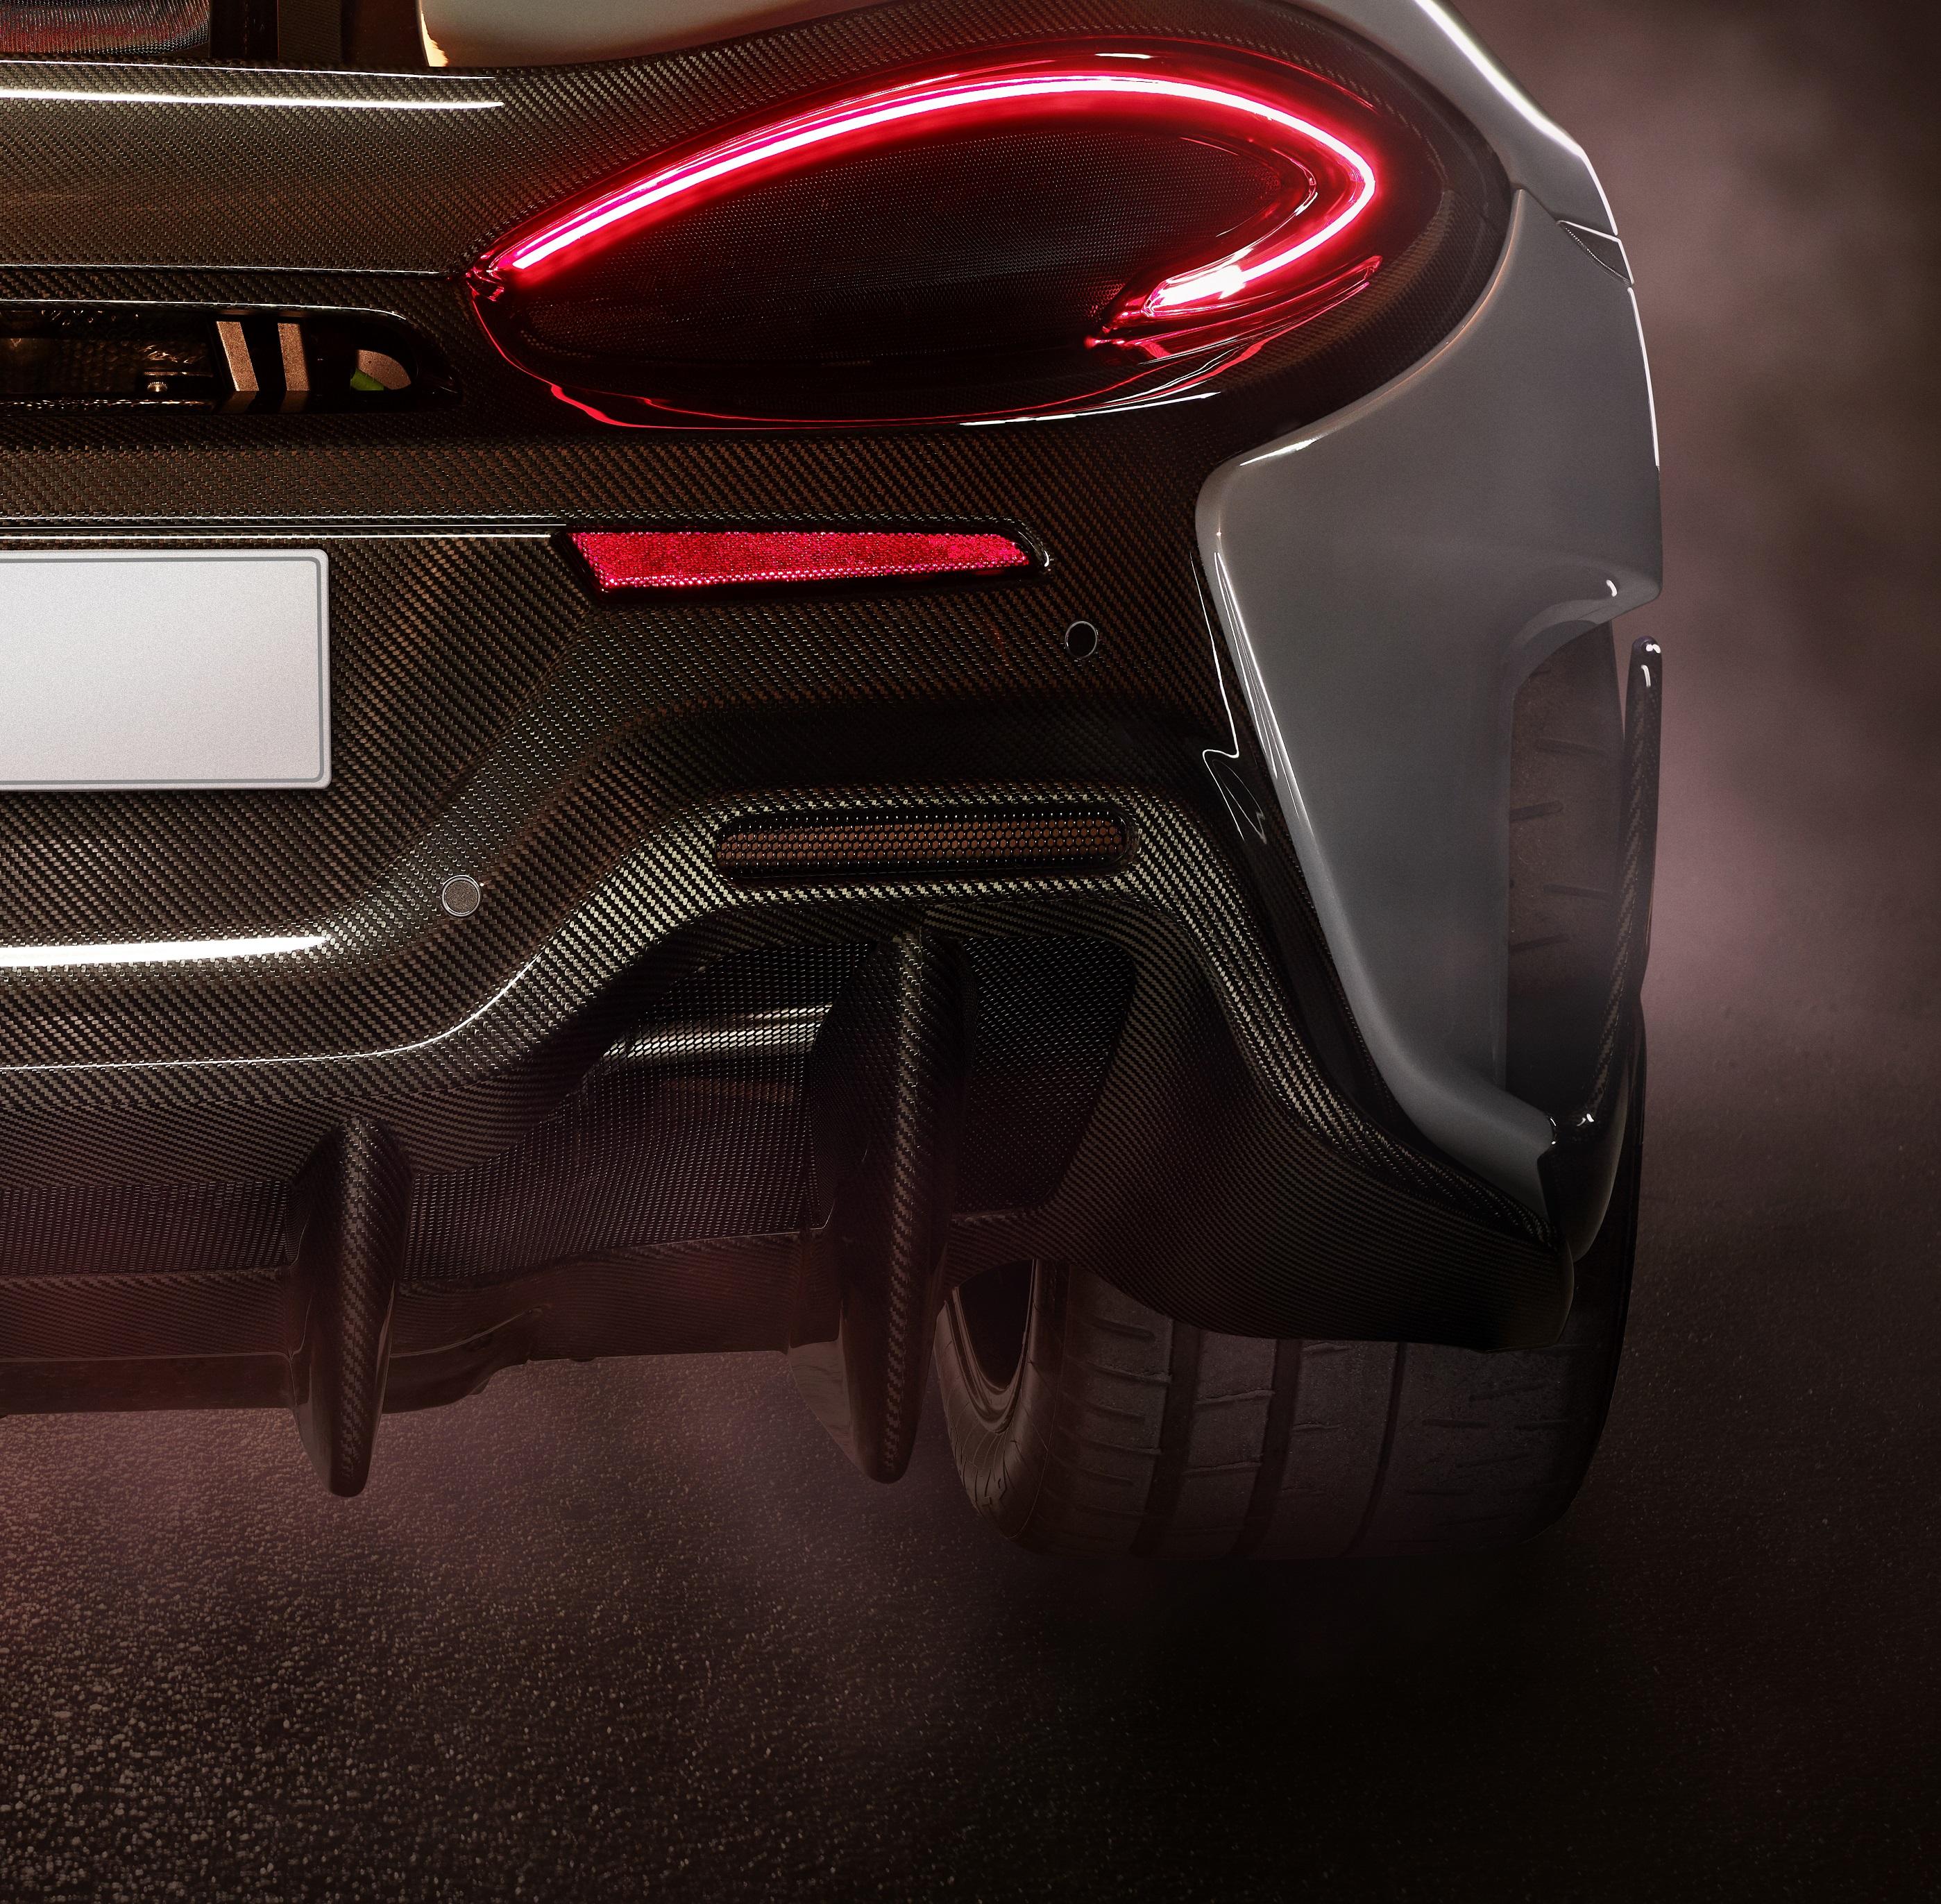 McLaren's Track22